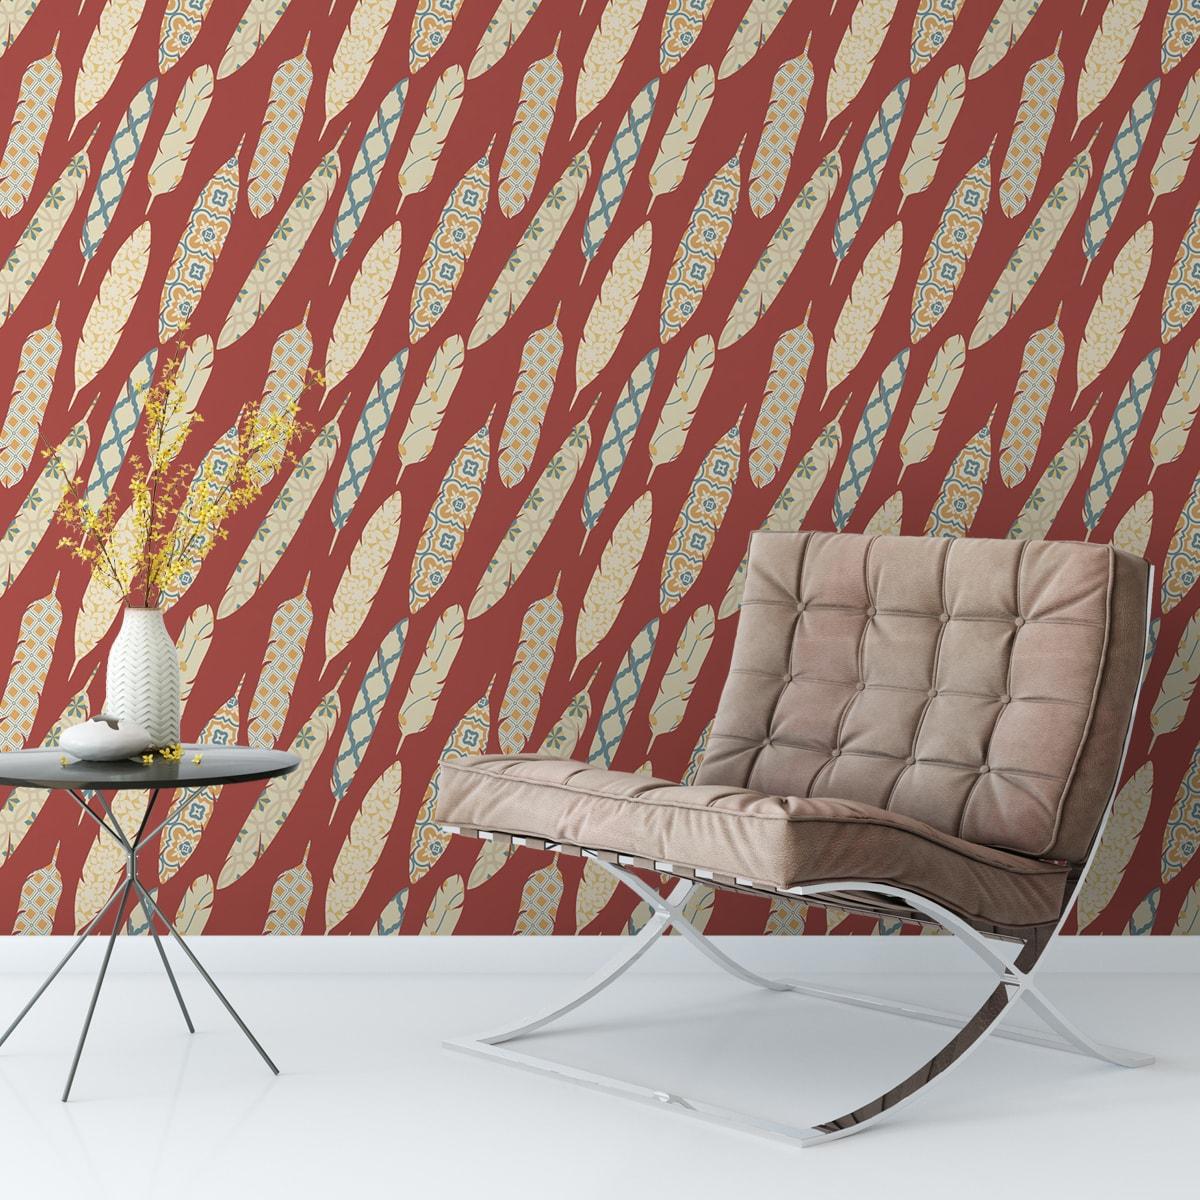 "Braune moderne Tapete ""Fancy Feathers"" mit dekorativem Feder Muster angepasst an Farrow and Ball Wandfarben 2"